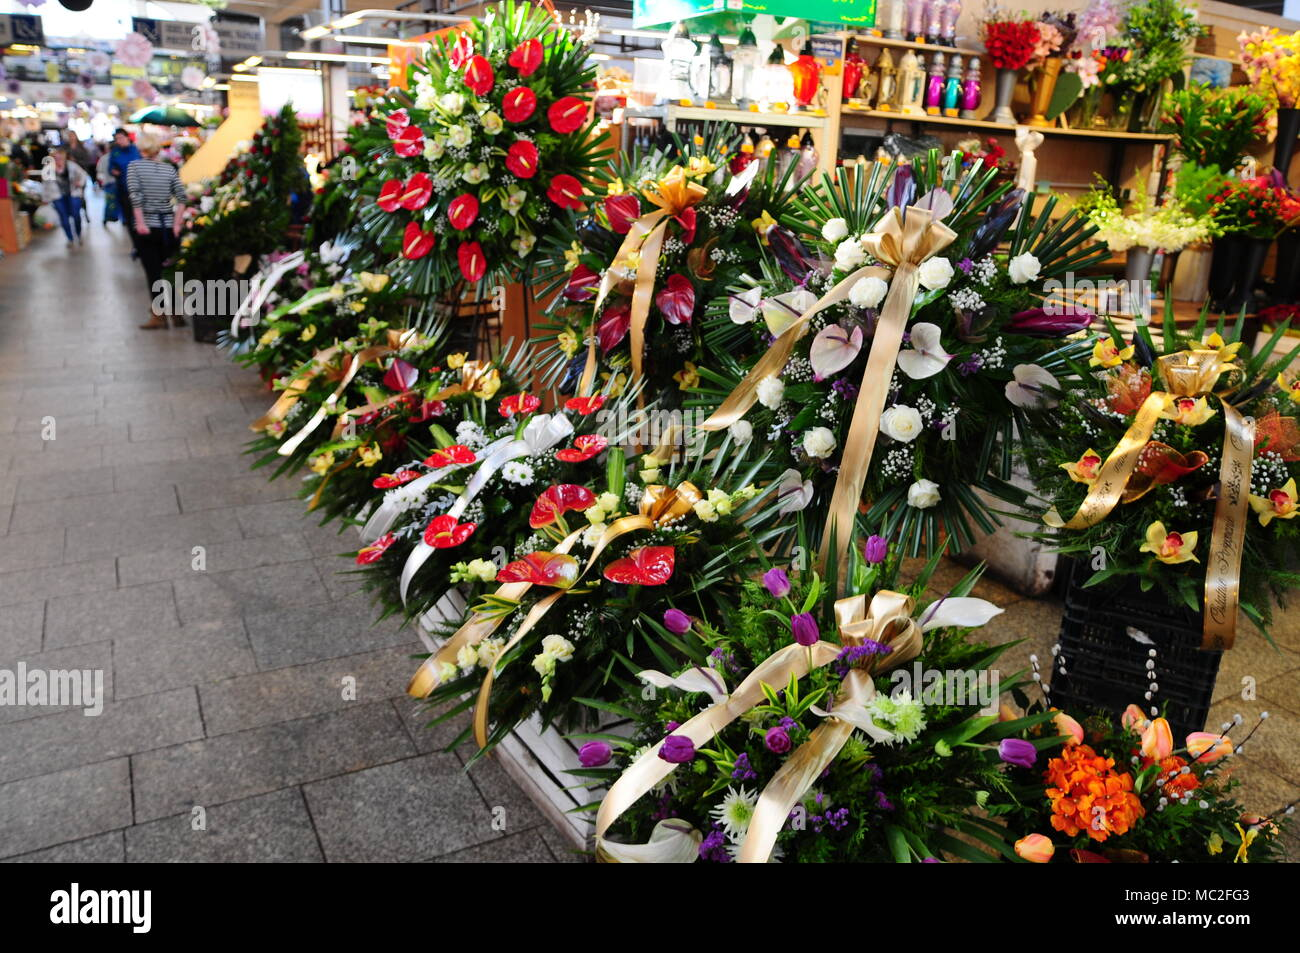 Hala Targowa Indoor Market Silesia Wroclaw Poland April 2018 Flower Stall Stock Photo Alamy